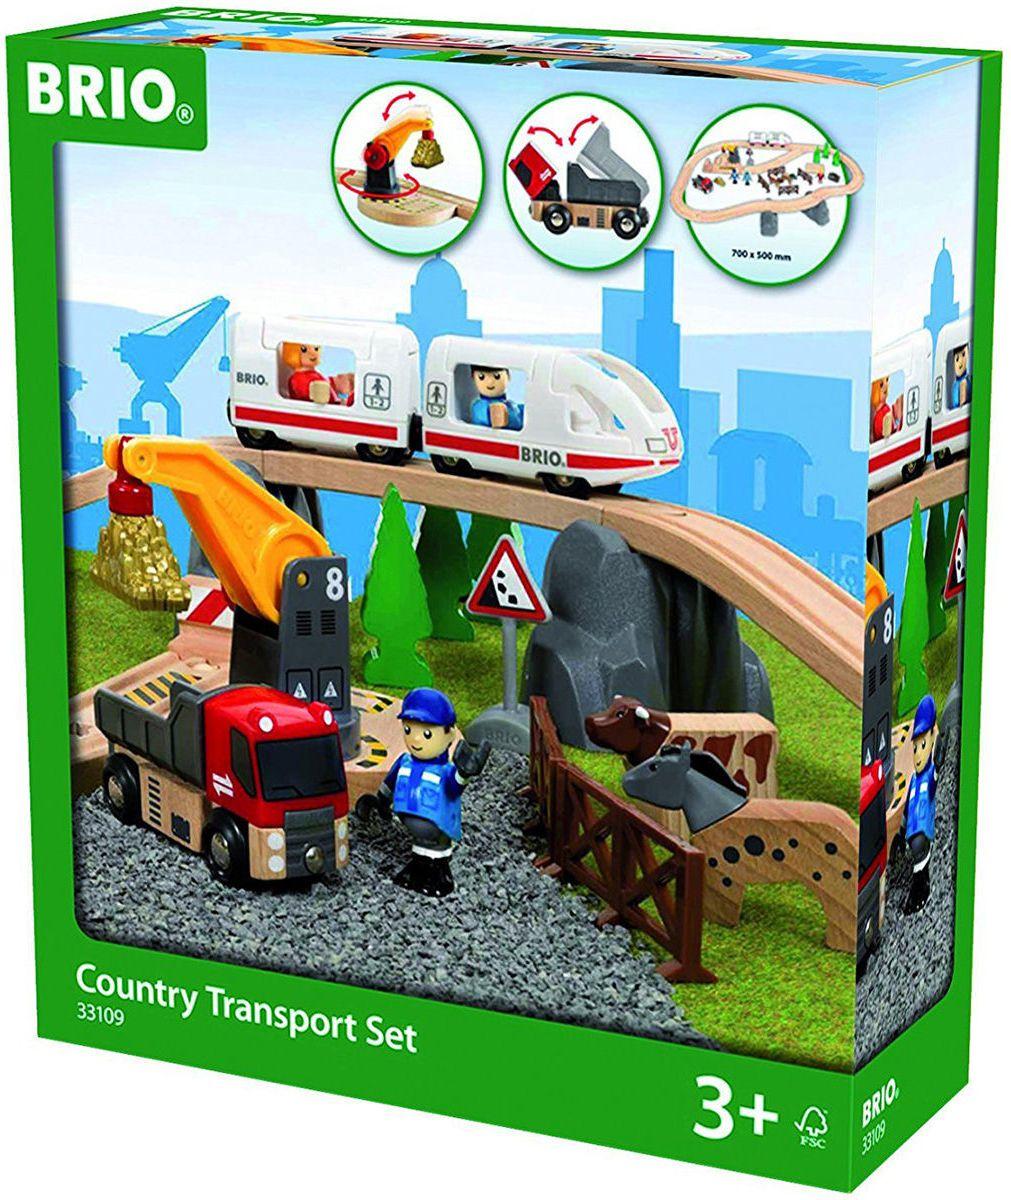 Brio Country Transport Set Rotaļu auto un modeļi